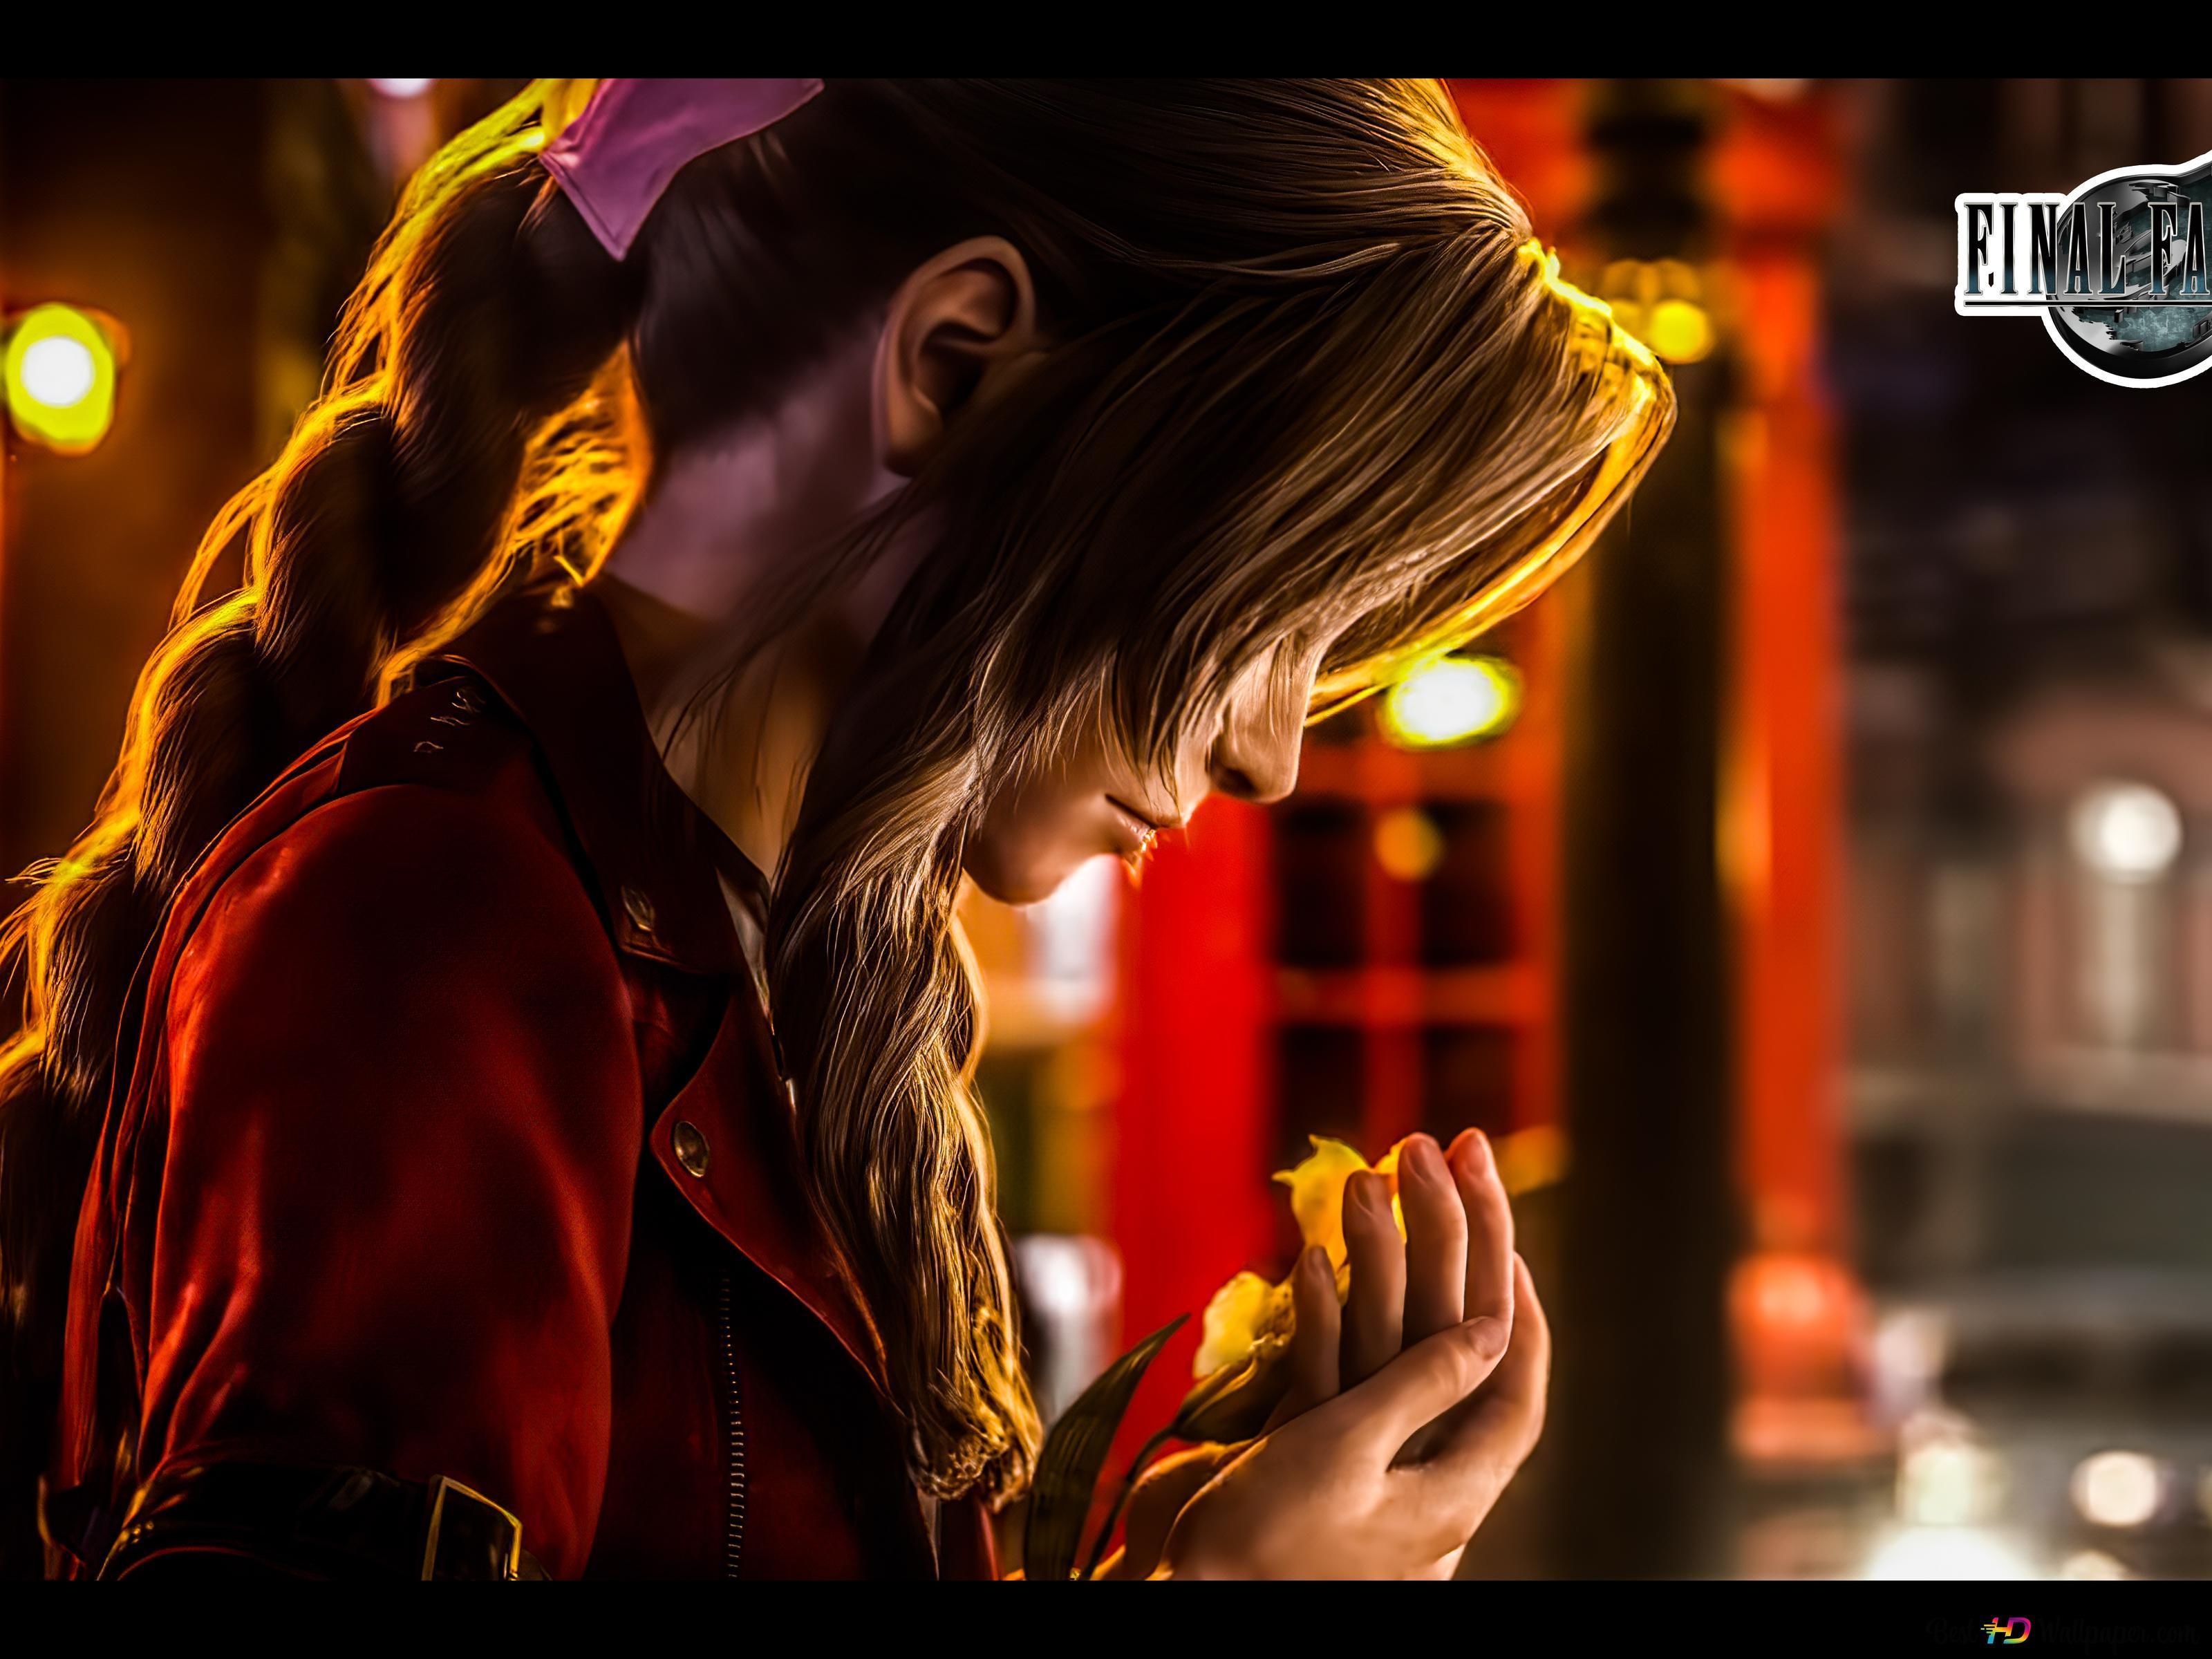 Final Fantasy 7 Remake Aeris 8k 4k Hd Wallpaper Download